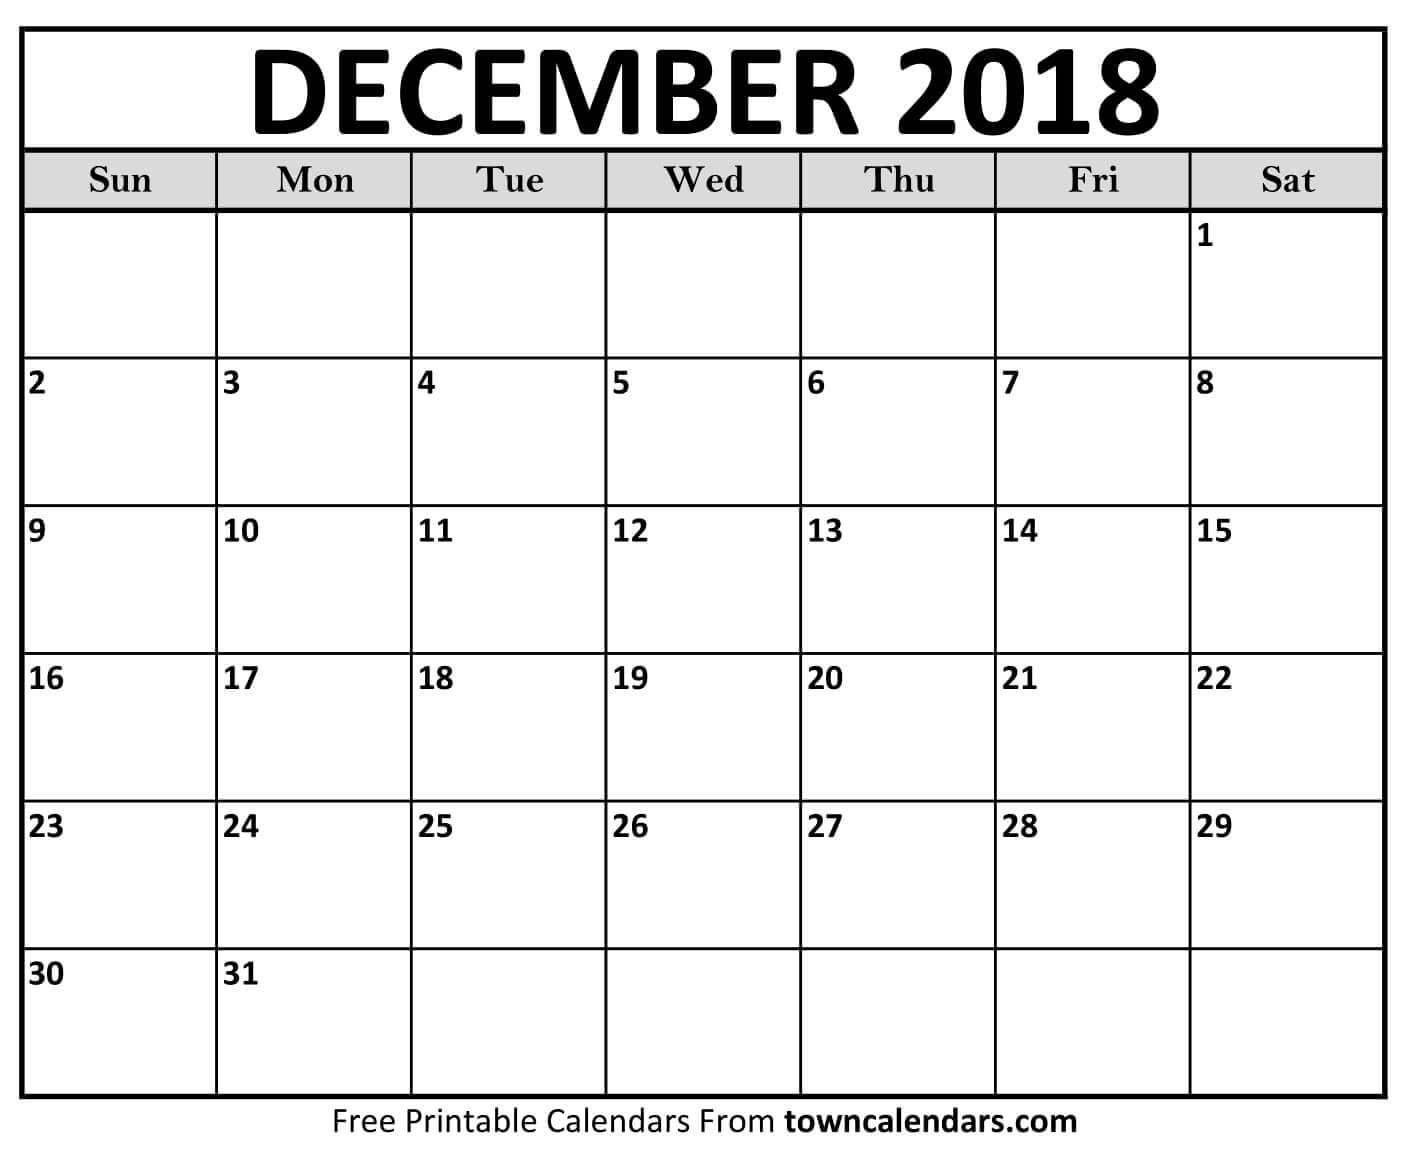 Printable 2018 December Calendar Template - Printable Calendar 2019 throughout Printable Blank Calendar For December